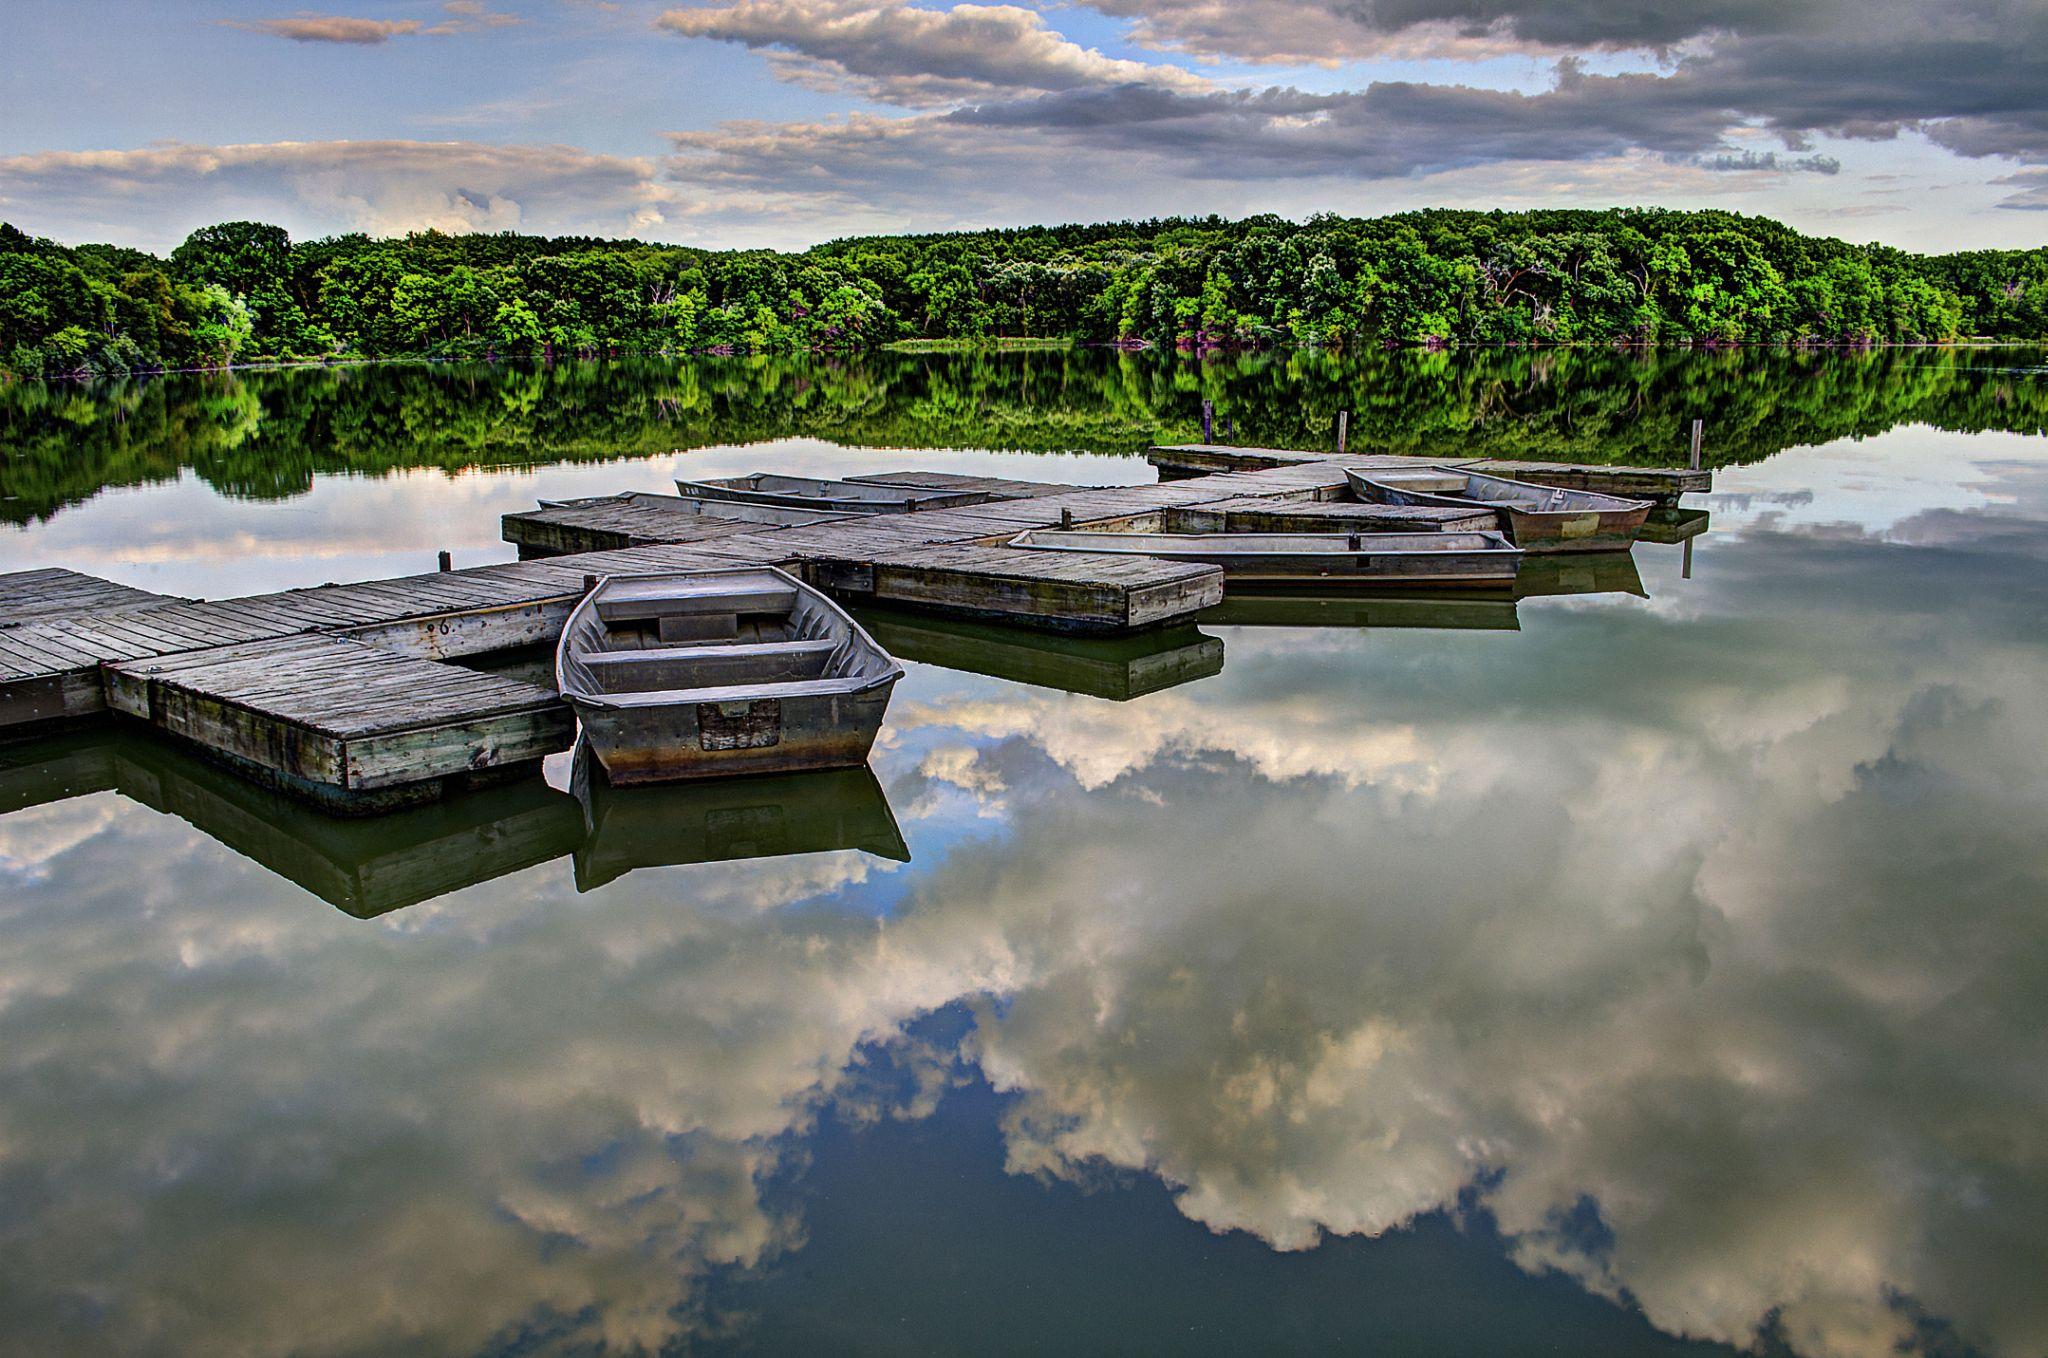 Heavenly Lake by J. Philip Larson Photography